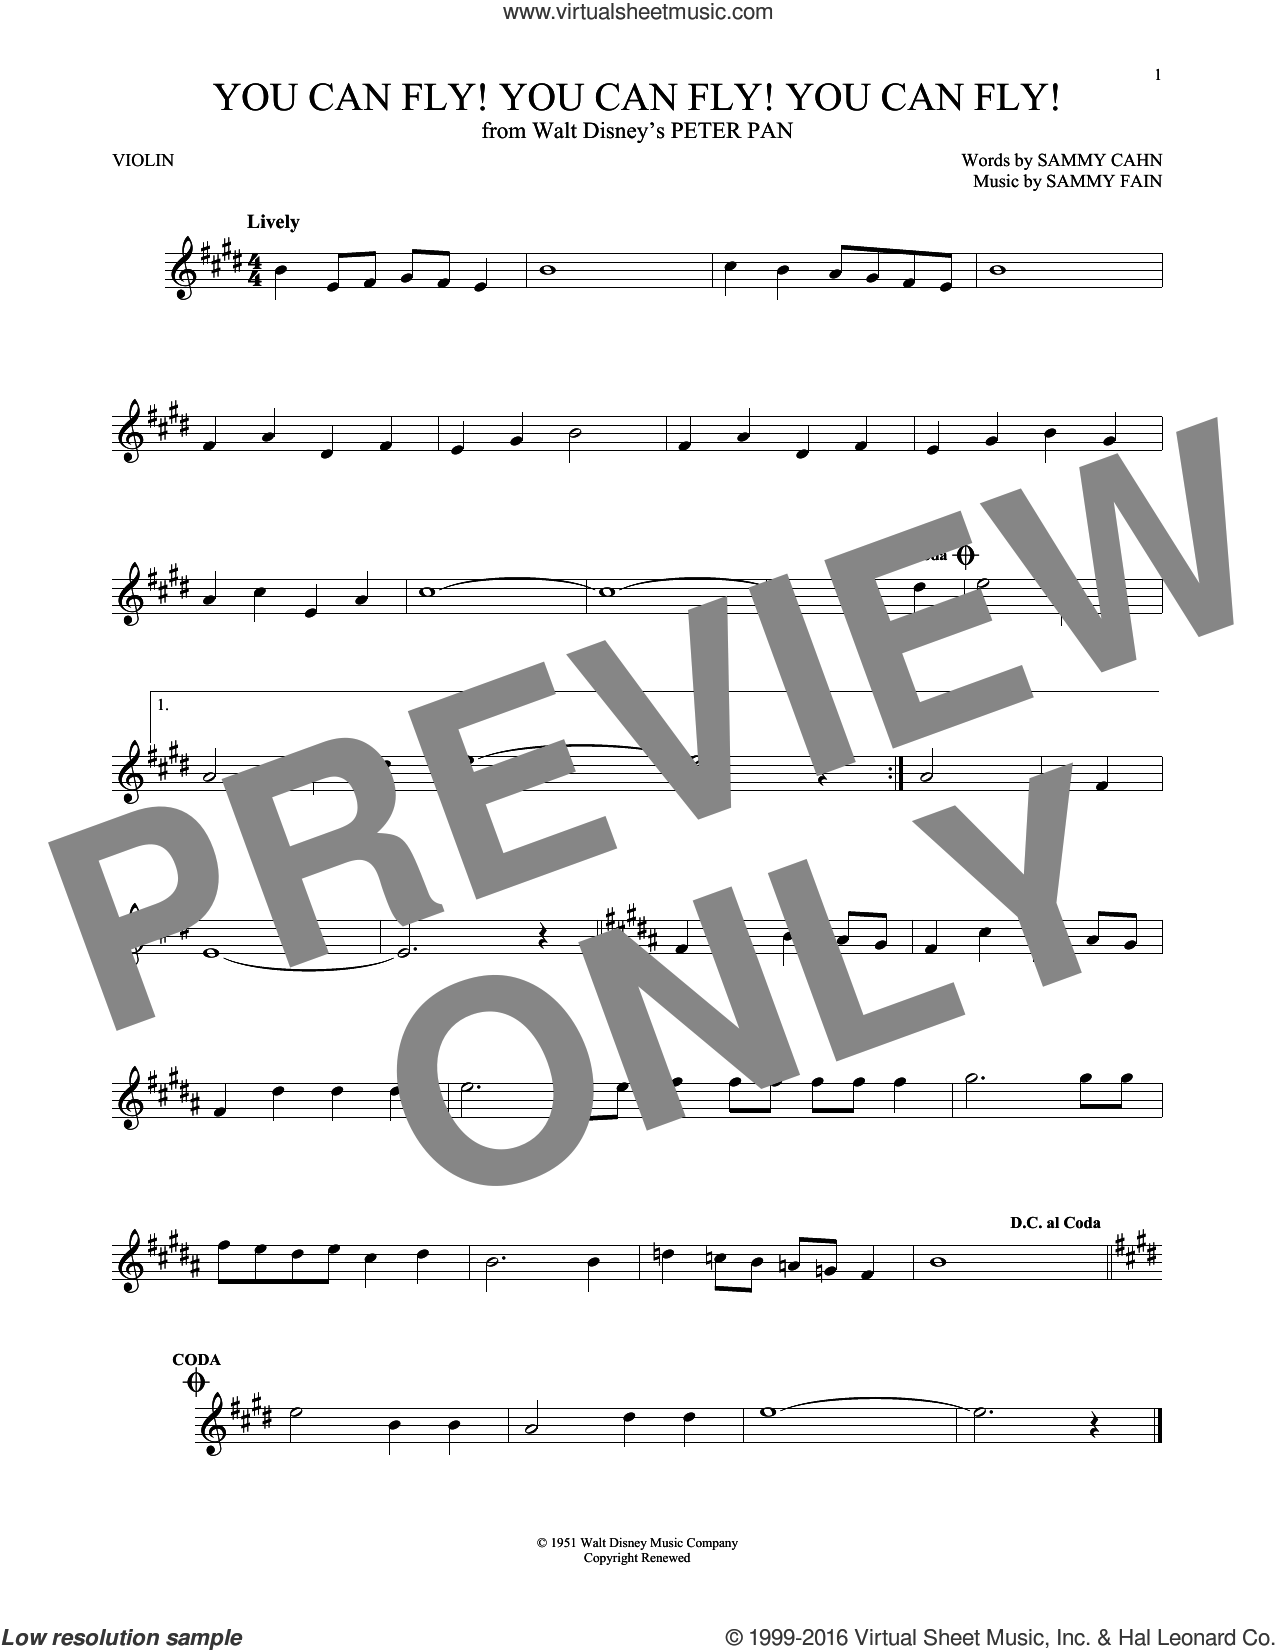 You Can Fly! You Can Fly! You Can Fly! sheet music for violin solo by Sammy Cahn and Sammy Fain, intermediate skill level